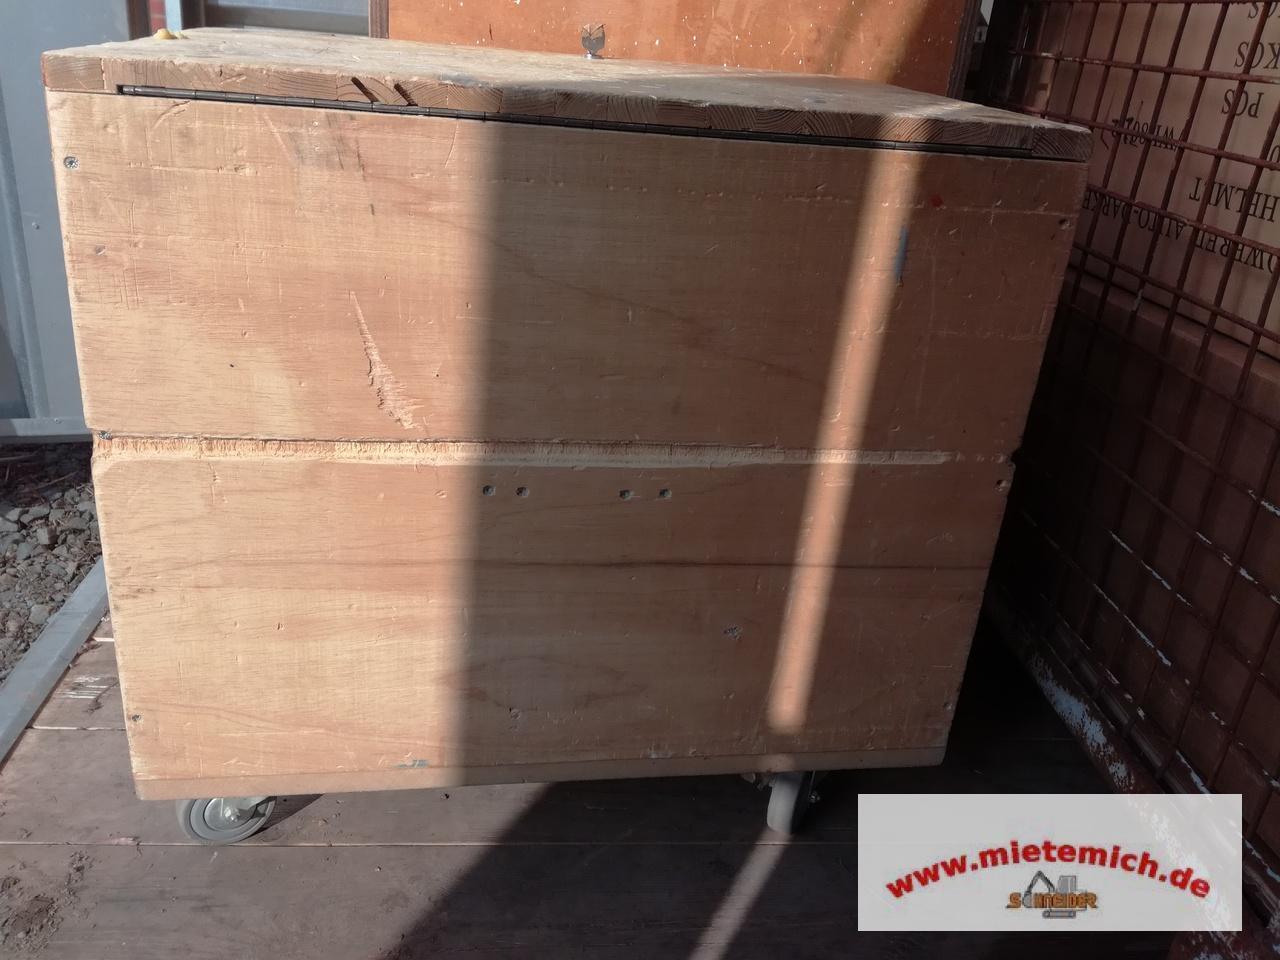 werkzeugkiste mit rollen holztruhe holzkiste holzkoffer schreinerkiste kiste 04 ebay. Black Bedroom Furniture Sets. Home Design Ideas